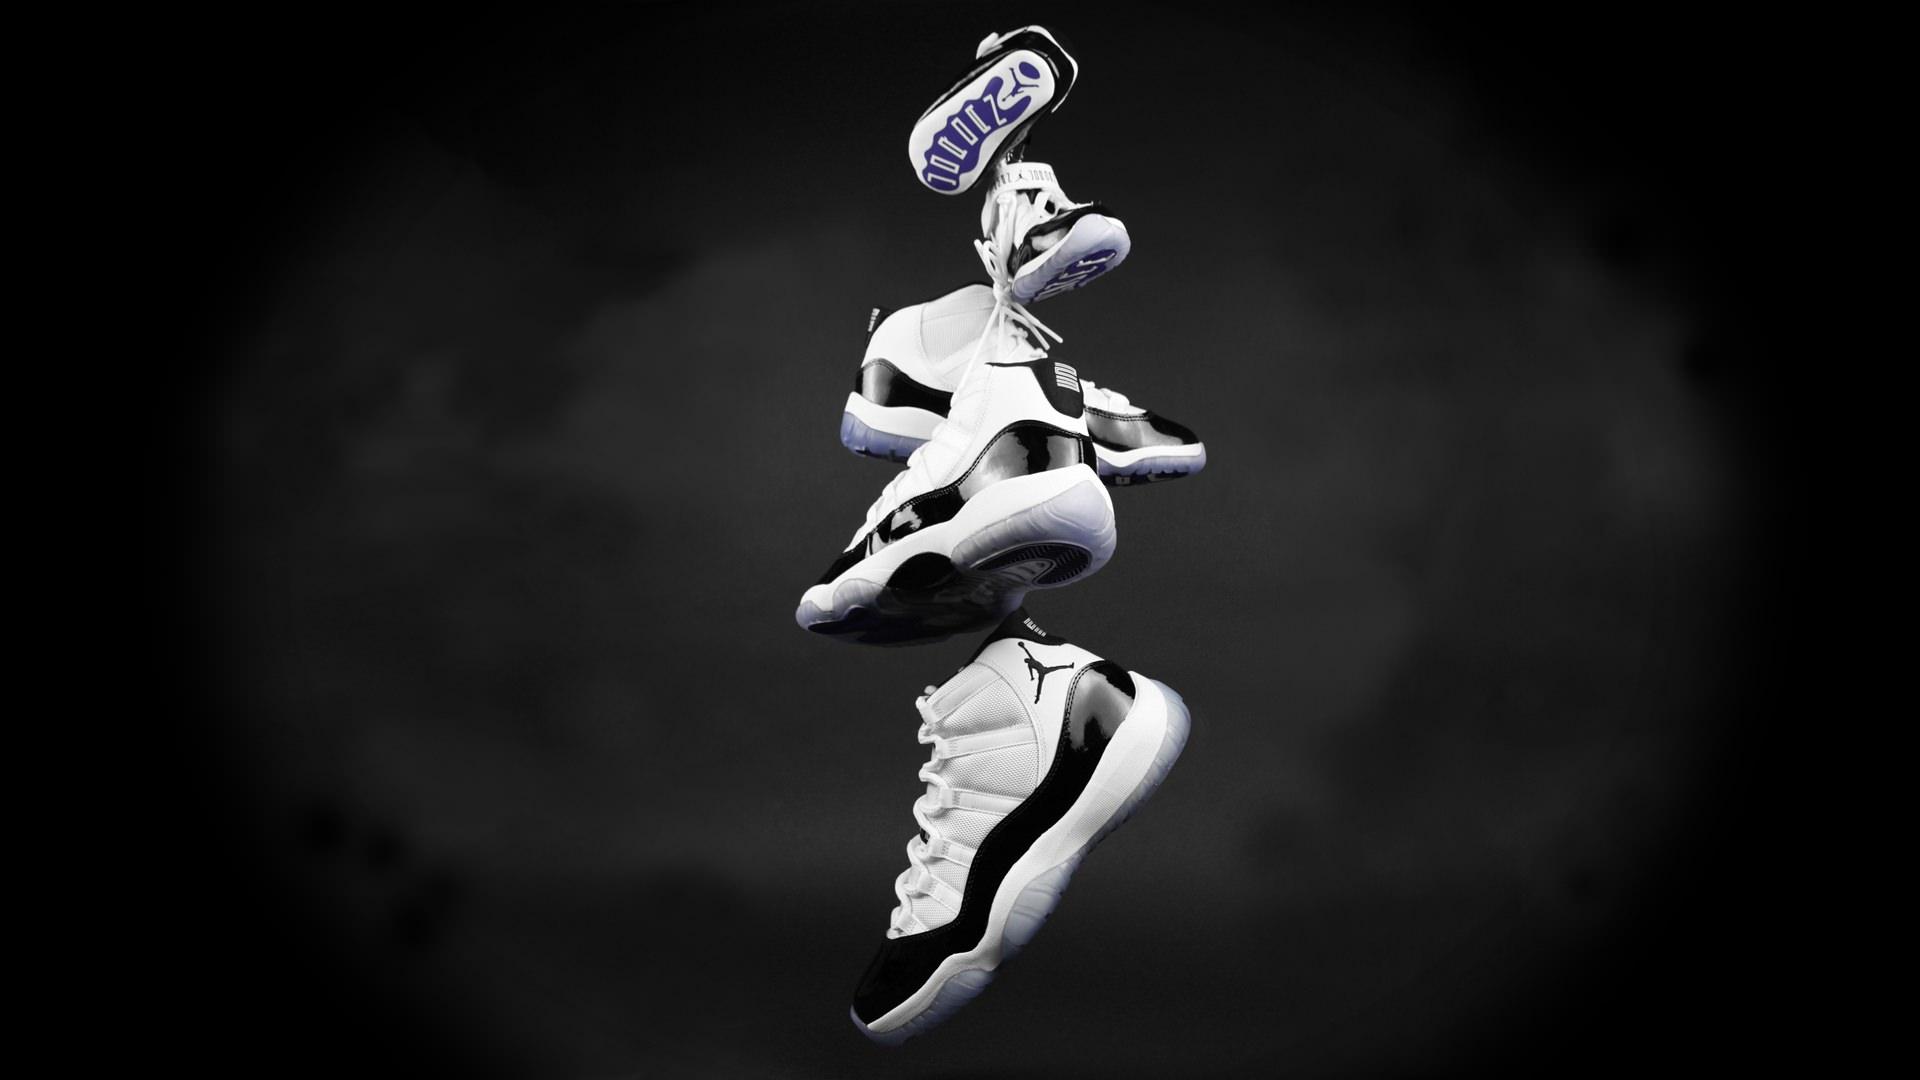 Air-Jordan-Find-best-latest-Air-Jordan-in-HD-for-your-PC-desktop-background-m-wallpaper-wp3402230